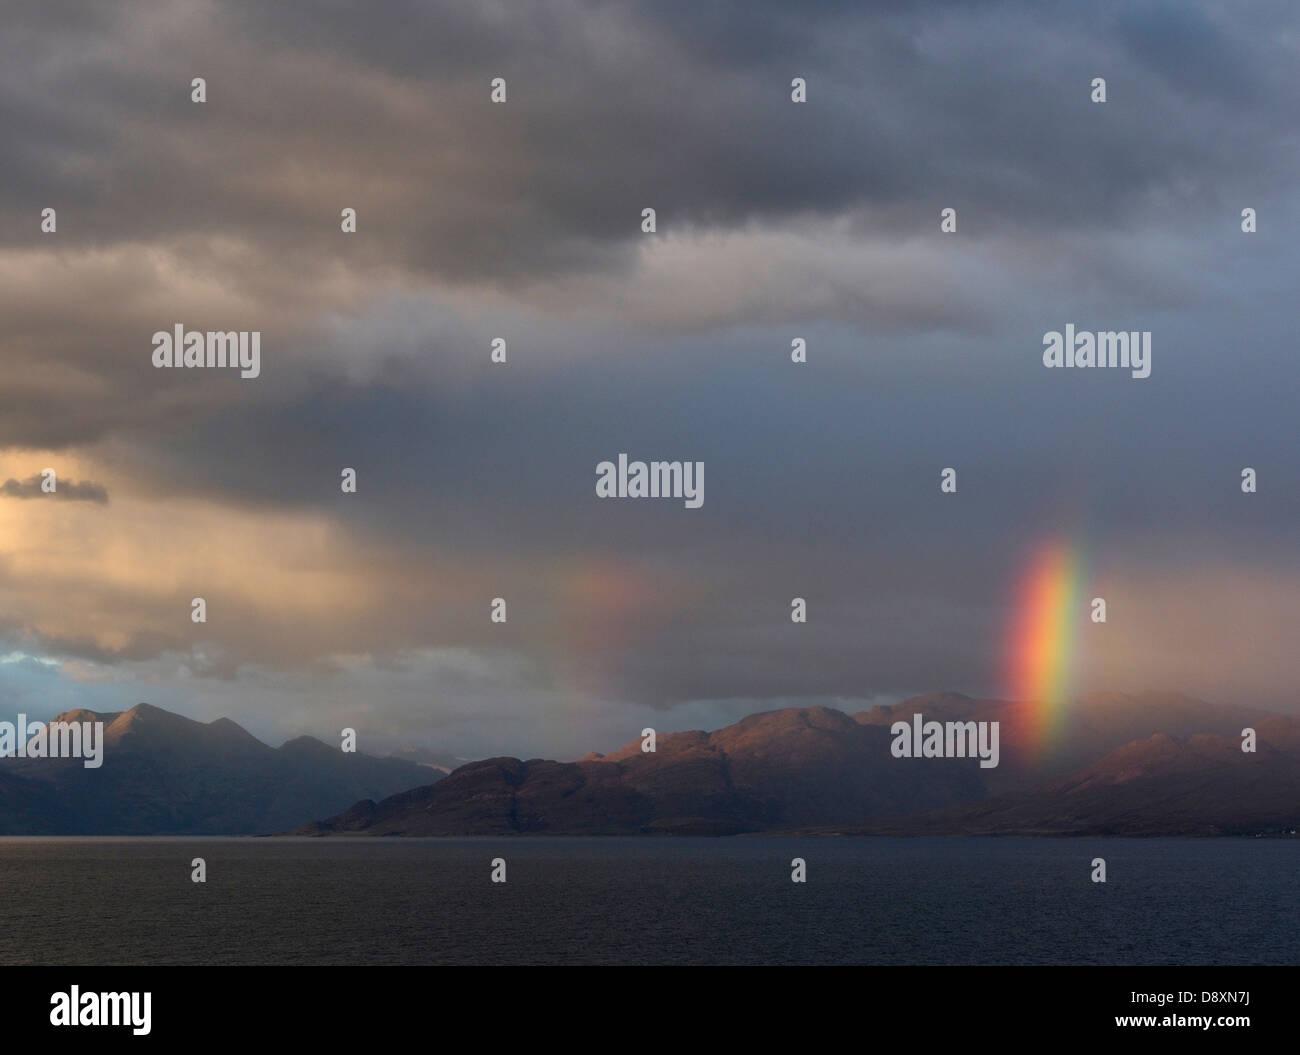 Rainbow over Knoydart from Sabhal Mor Ostaig, Sleat peninsula, Skye, Scotland - Stock Image